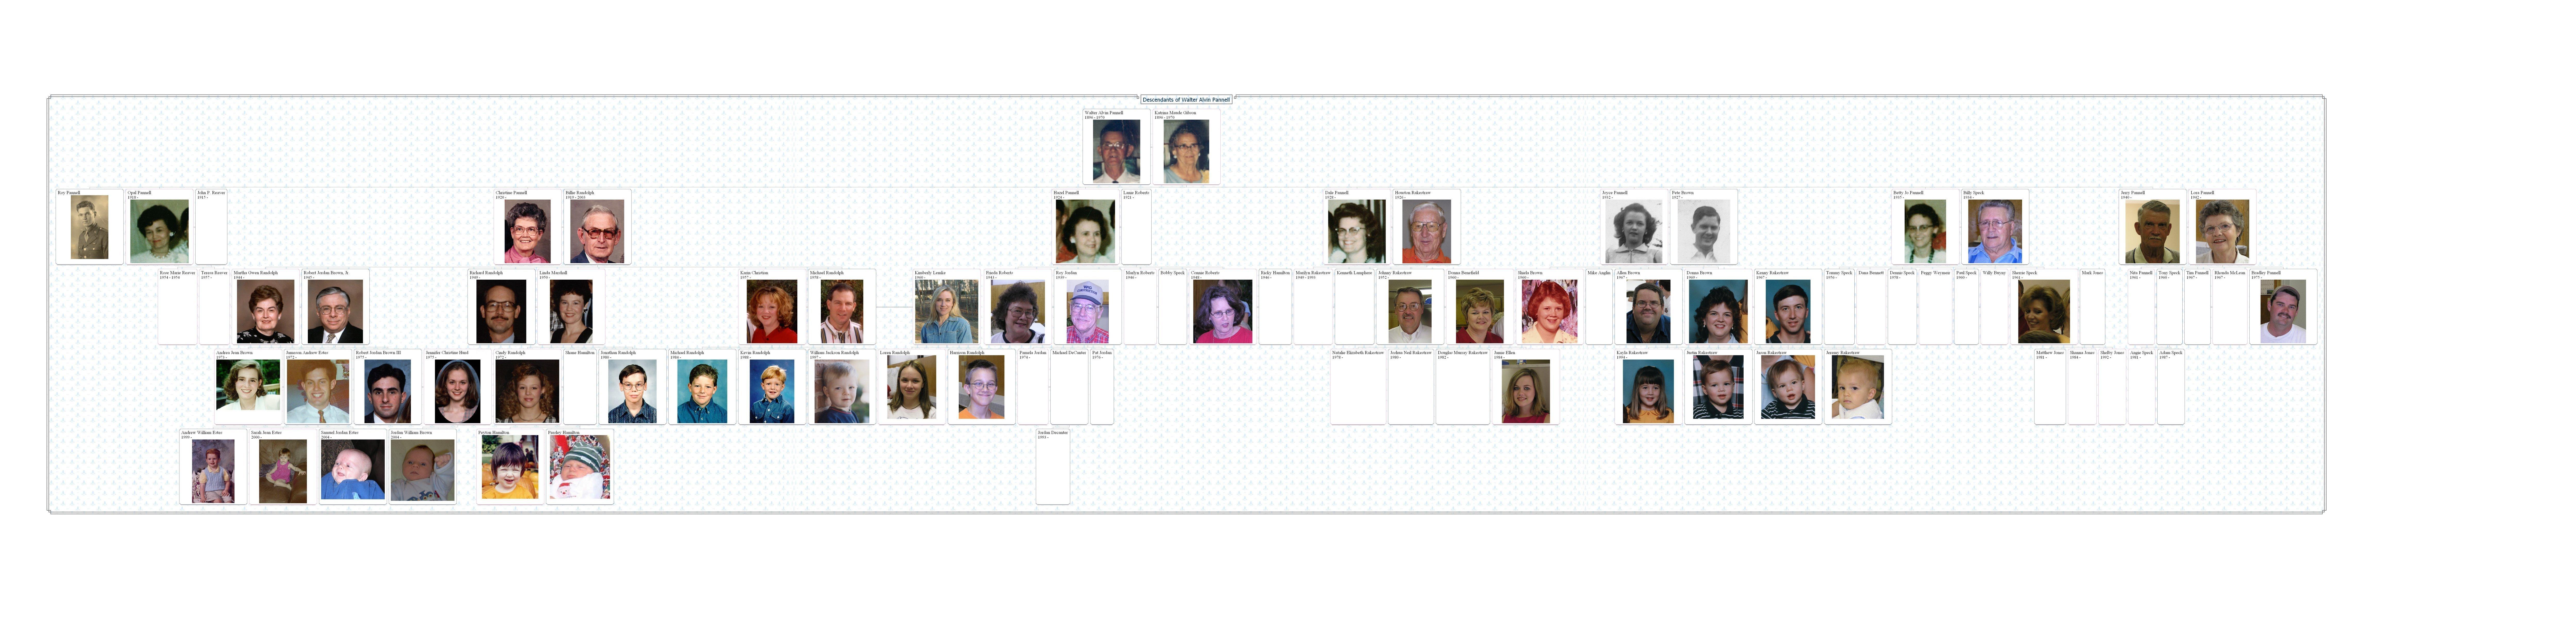 Palmer descendant tree pannell family pannell descendant tree file